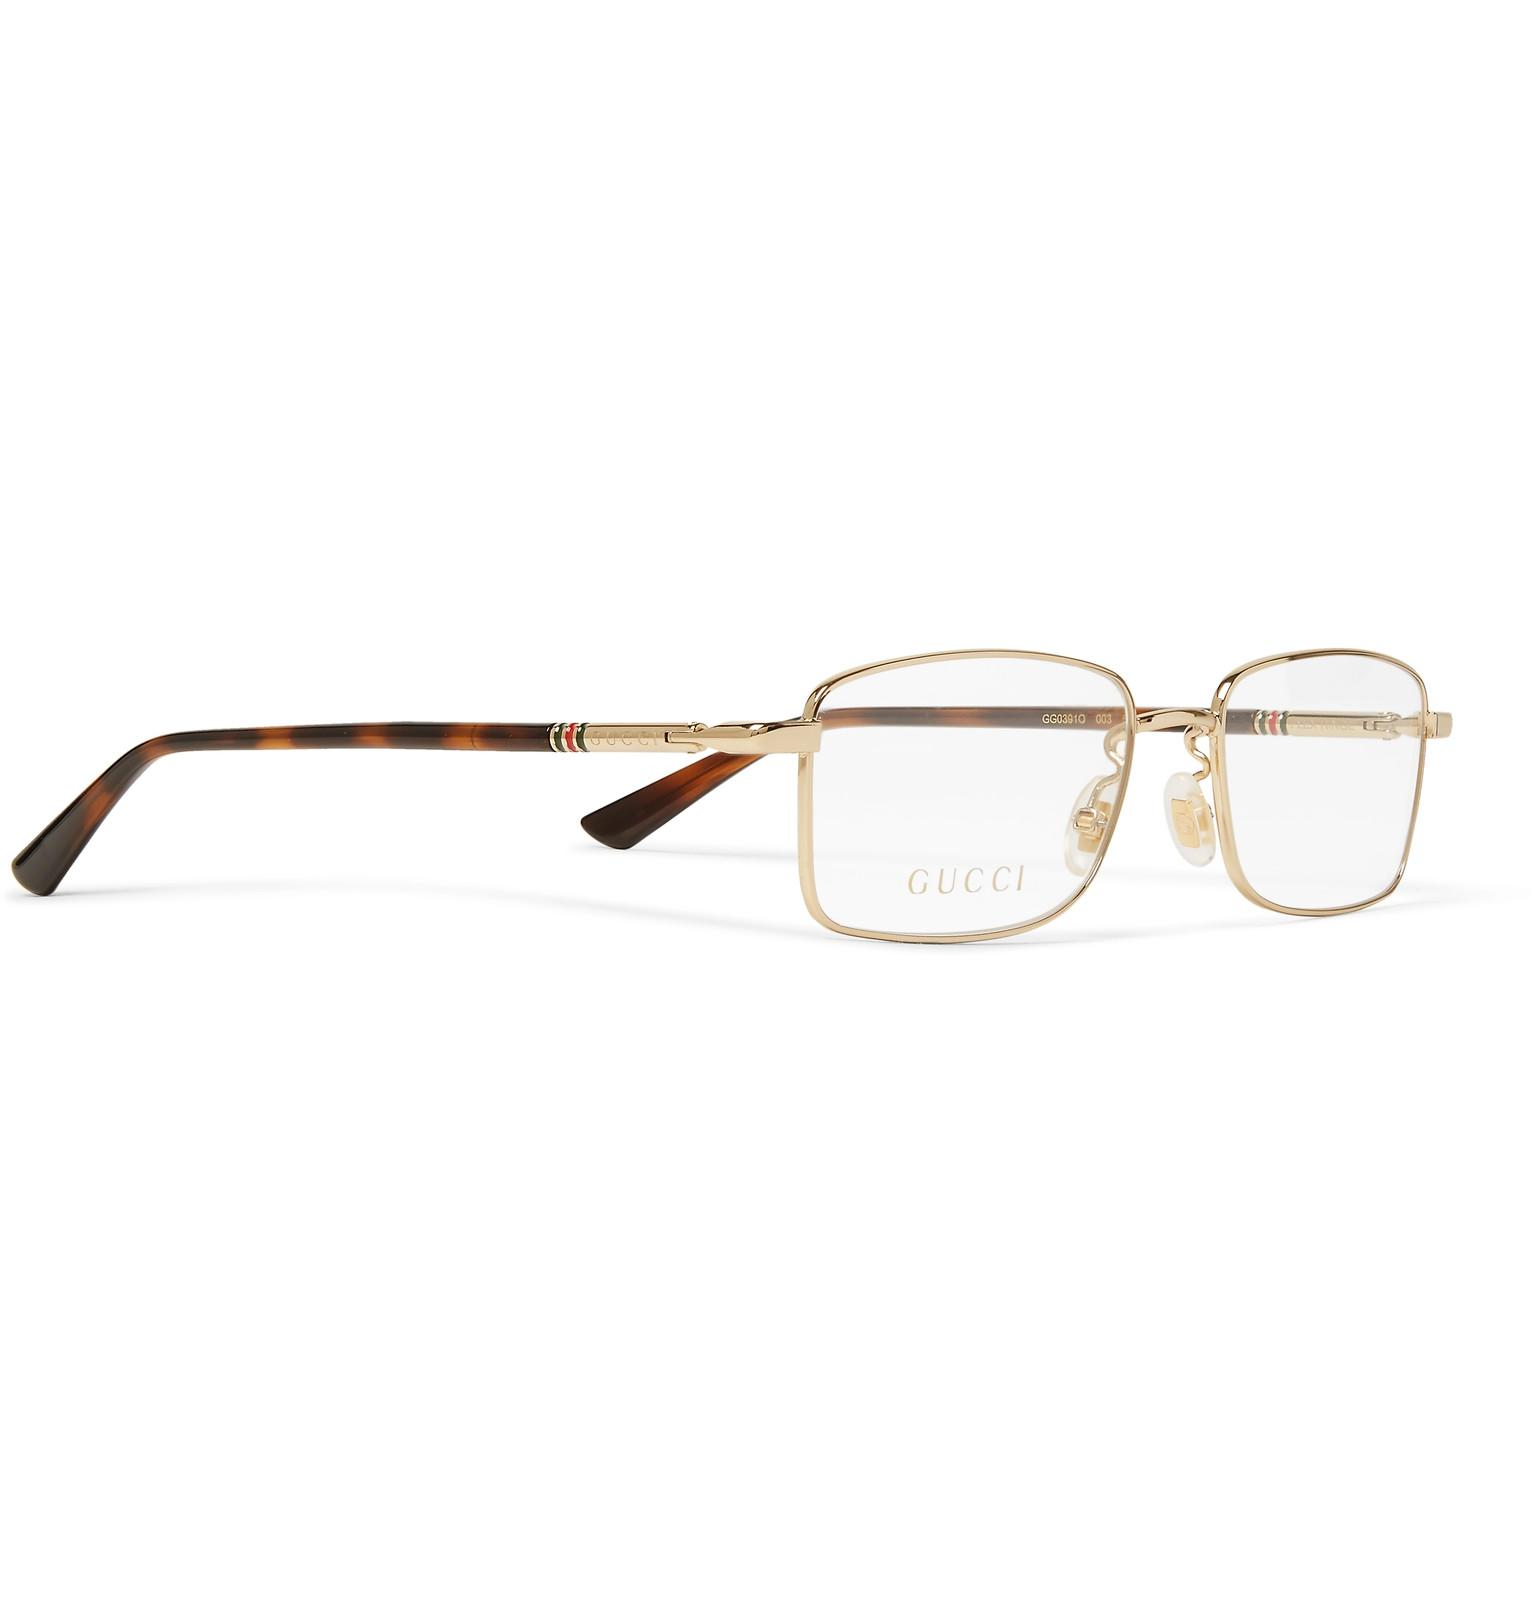 6d5a2b5a98 Gucci - Metallic Square-frame Gold-tone Optical Glasses for Men - Lyst.  View fullscreen